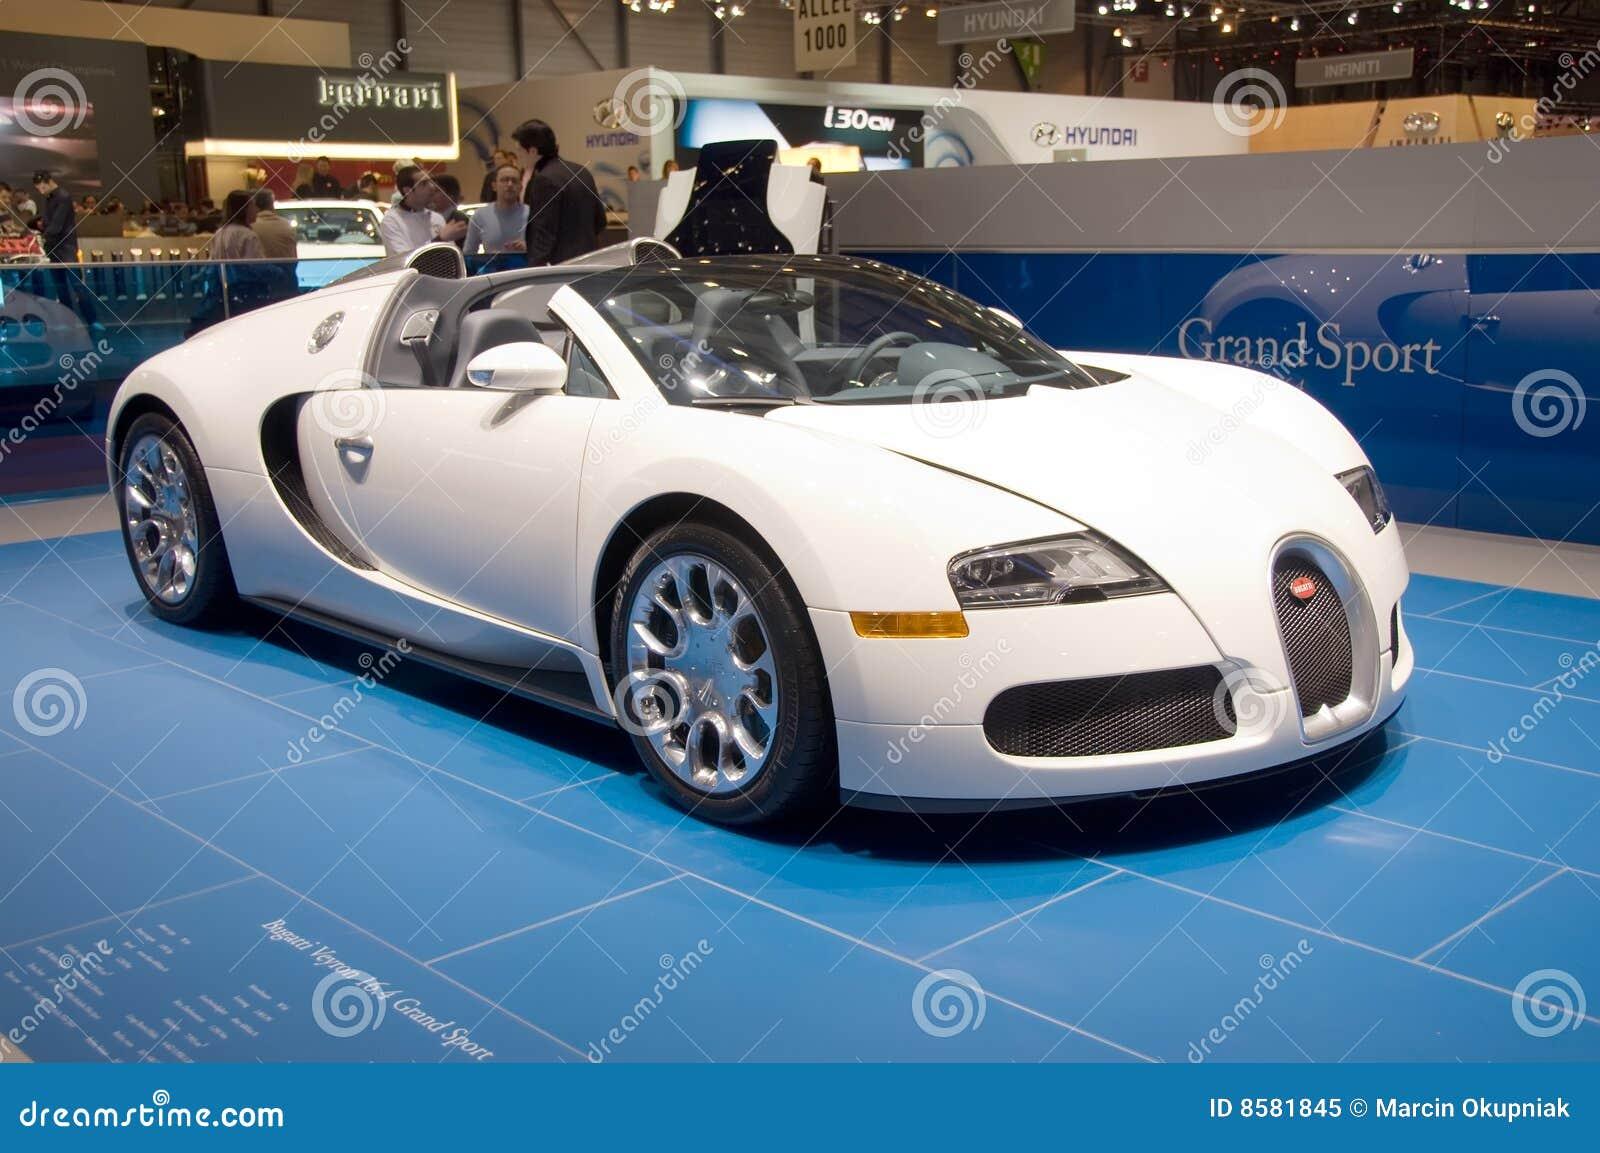 Veyron grand de sport du bugatti 4 16